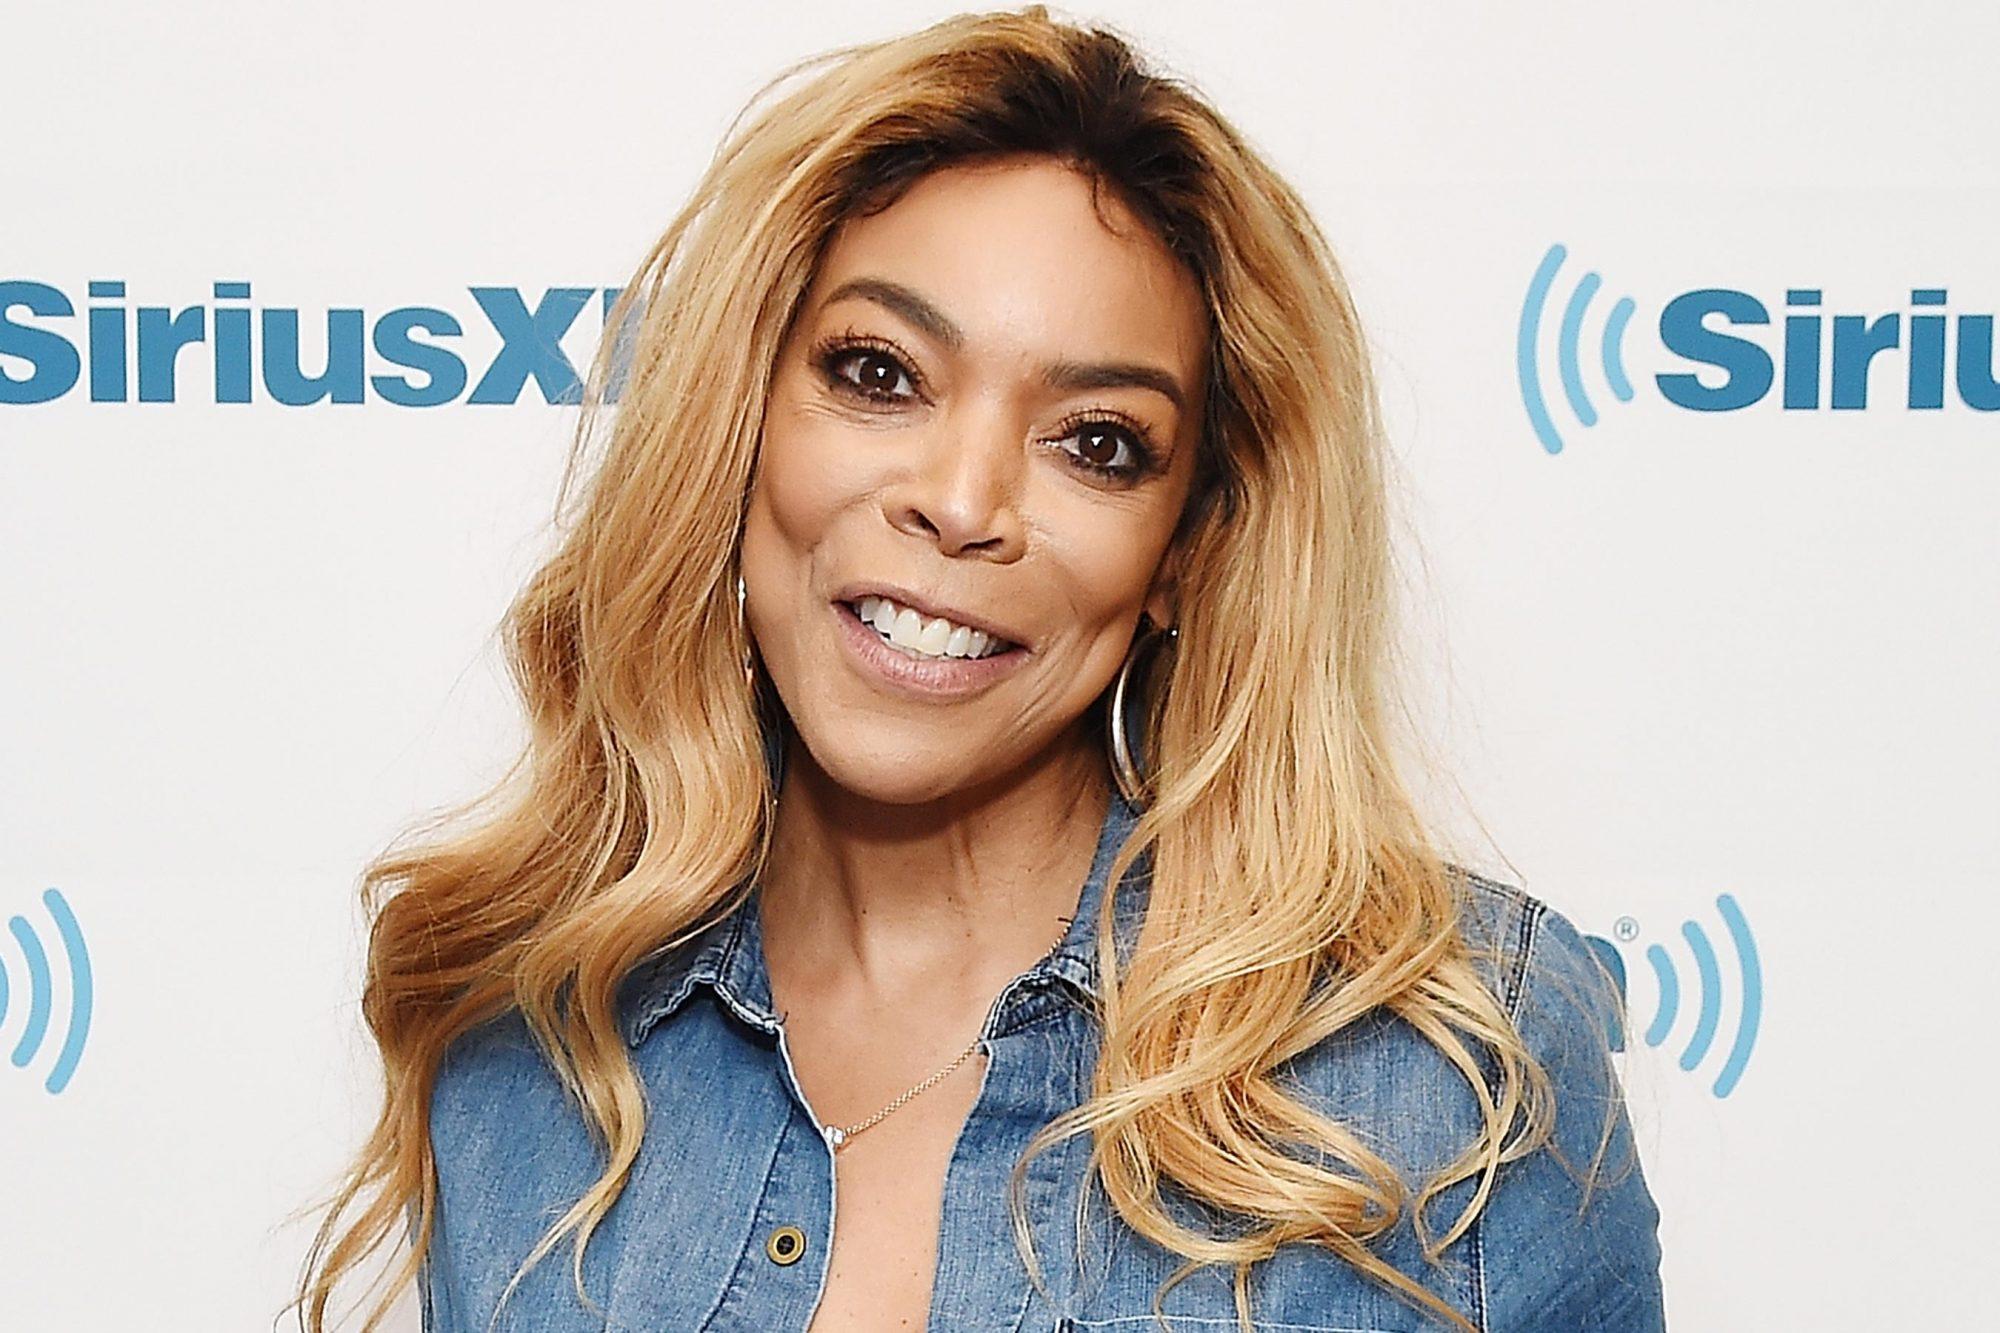 Celebrities Visit SiriusXM - July 13, 2017